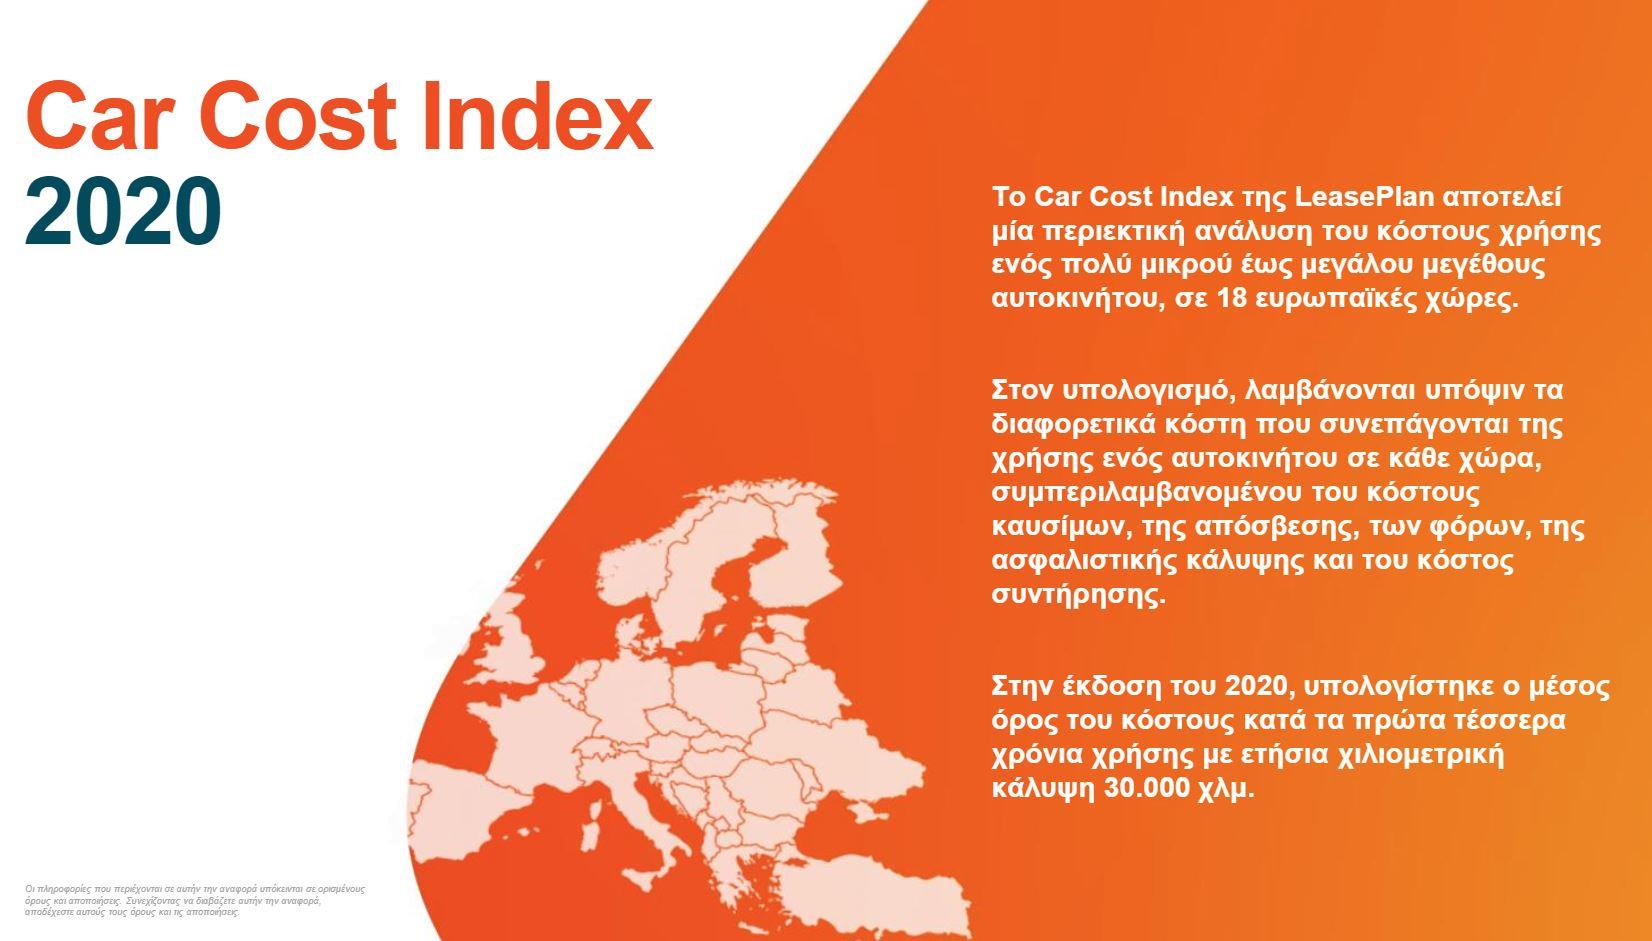 Car-Cost-Index-2020-2